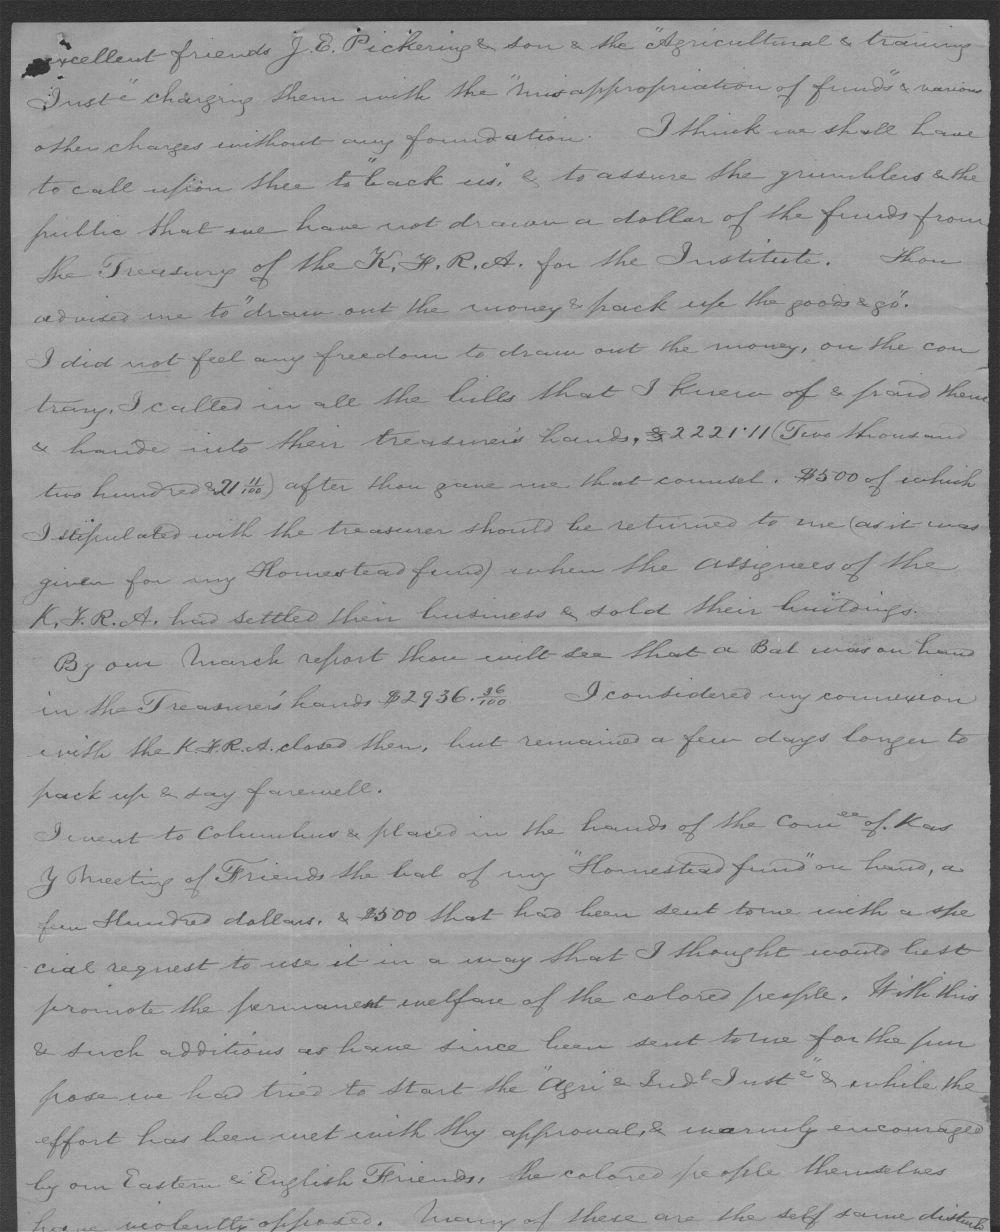 Elizabeth Comstock to John P. St. John - 3